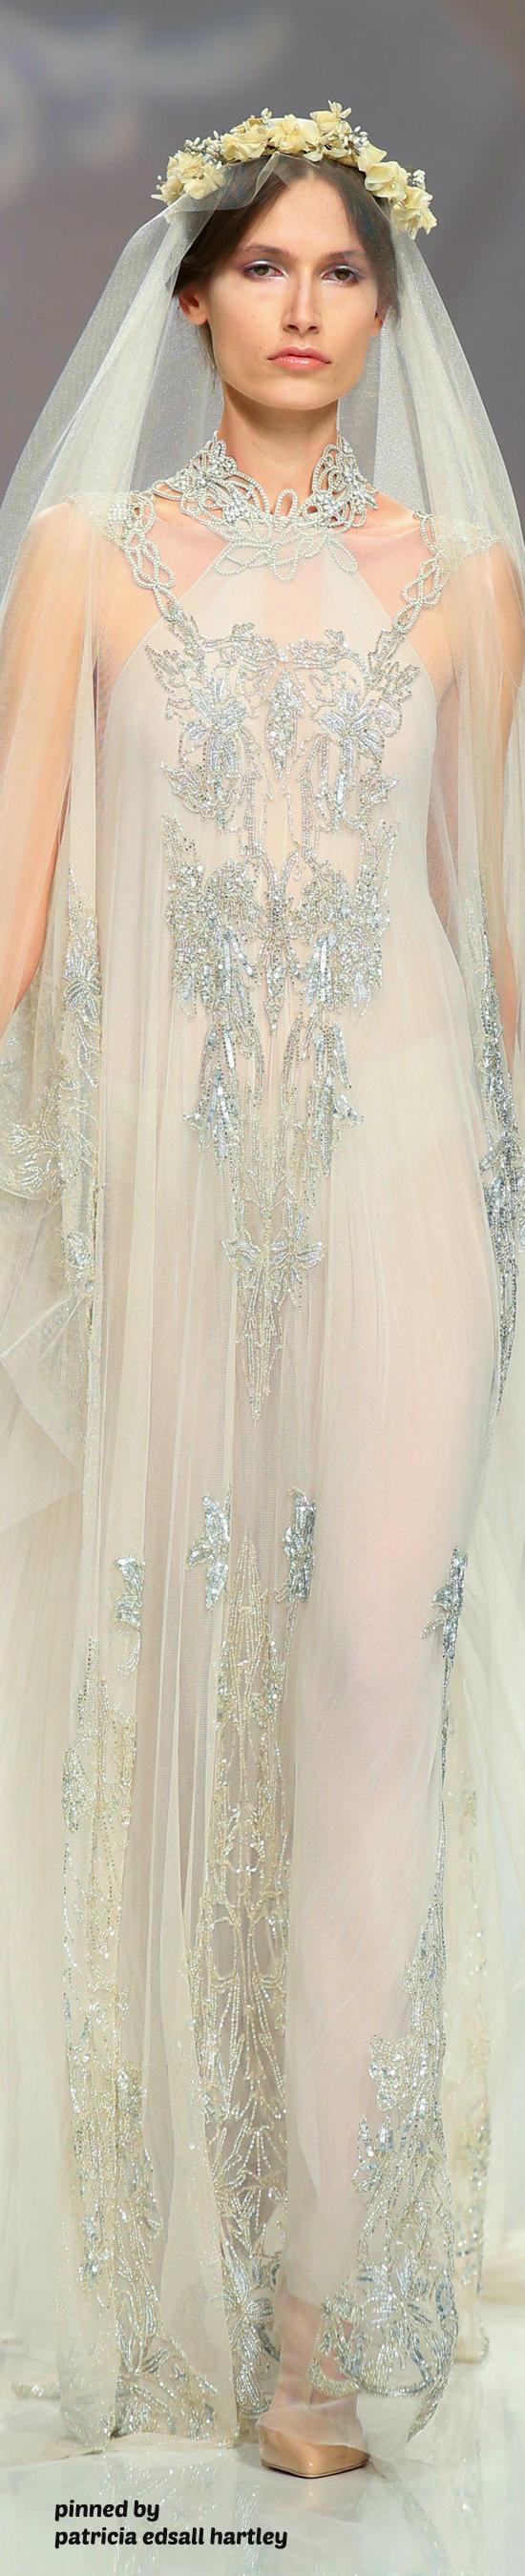 Marco Maria Bridal - Spring 2017 | wedding ideas | Pinterest | Para ...